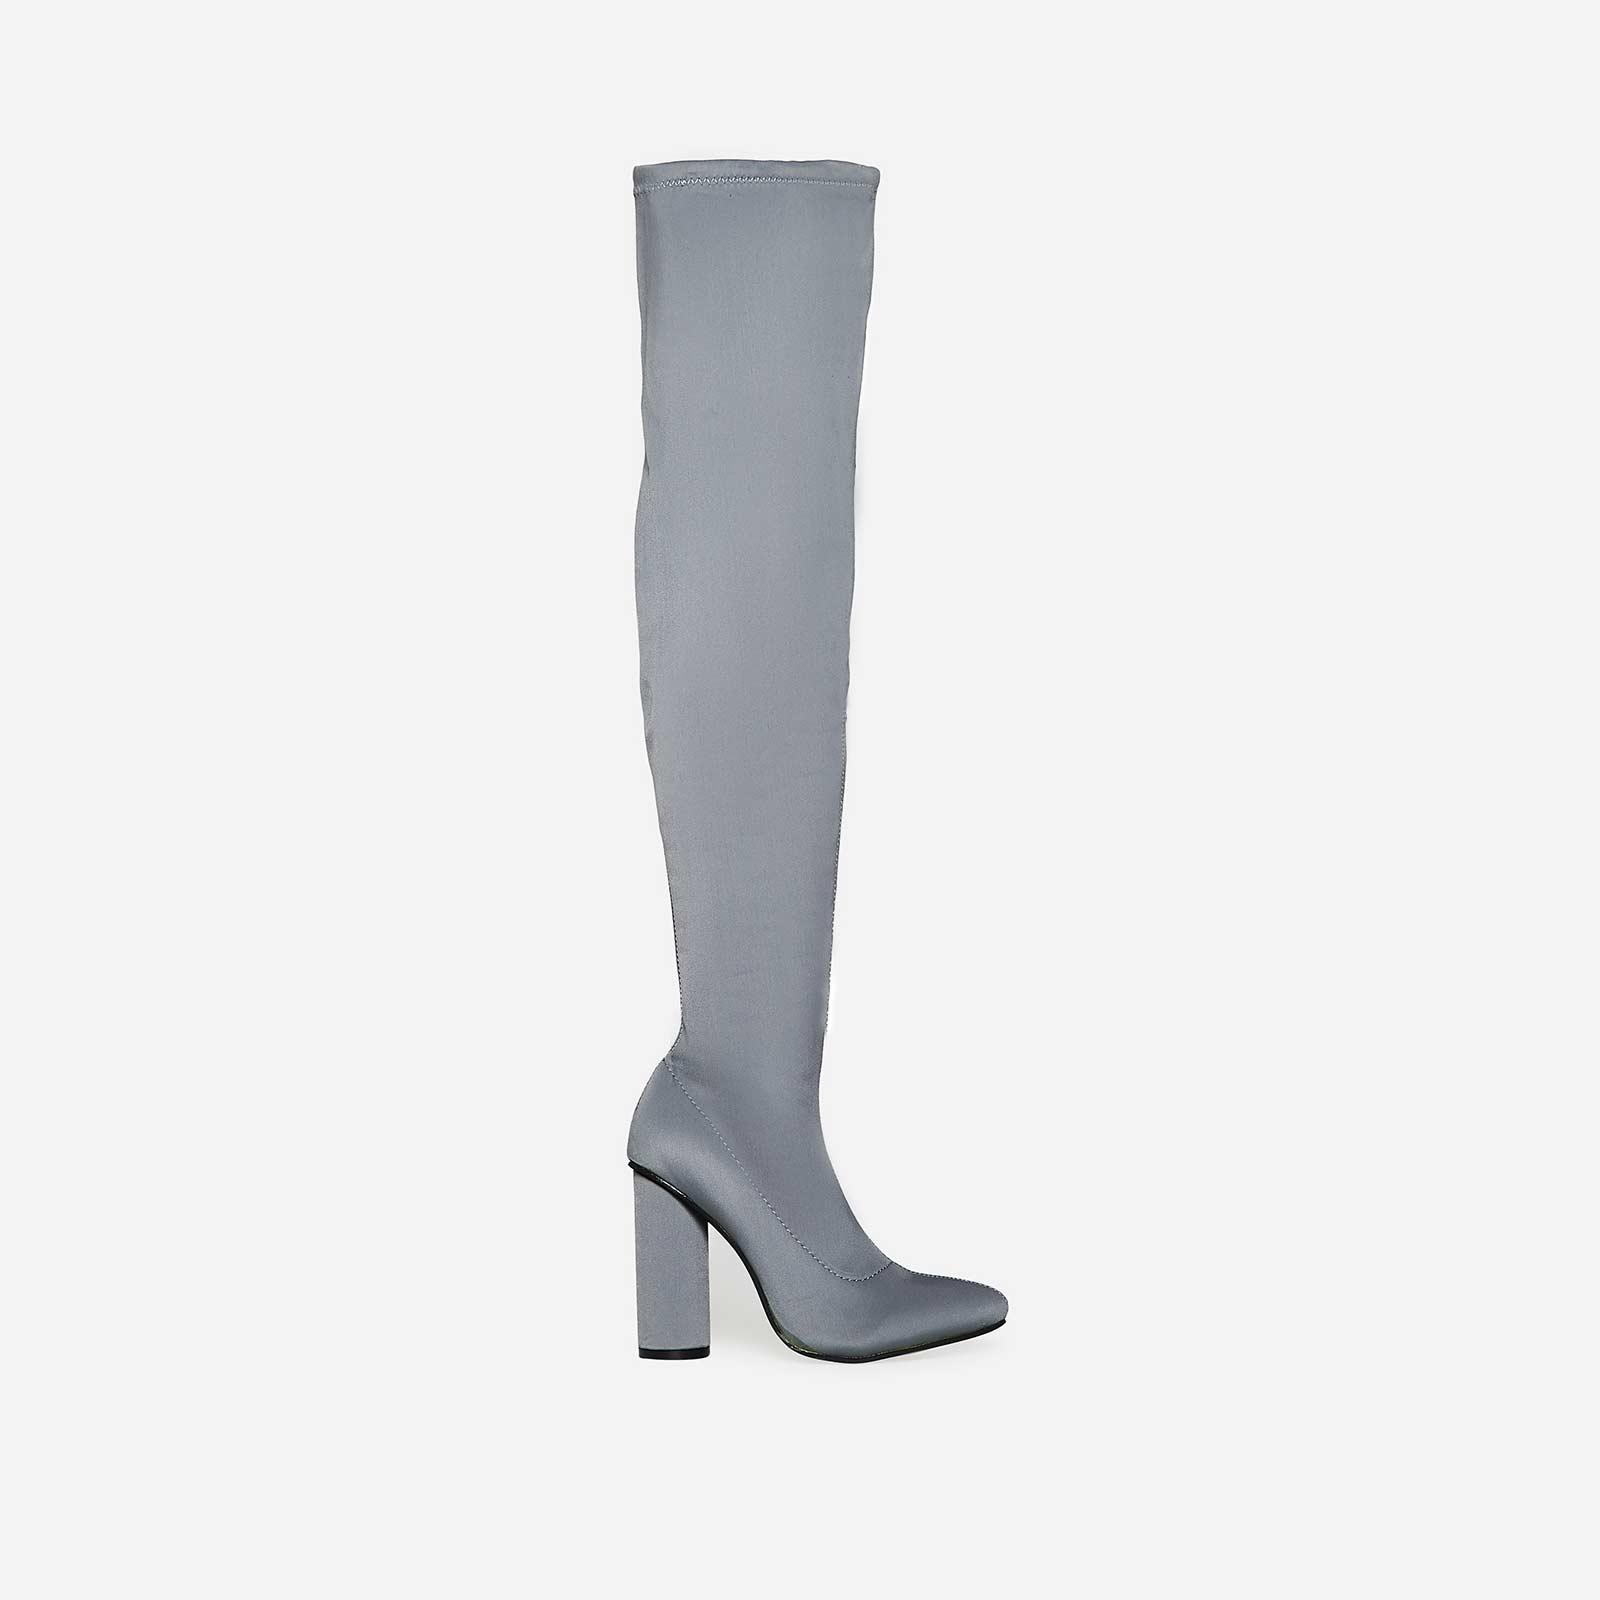 Jaxx Long Boot In Light Grey Lycra